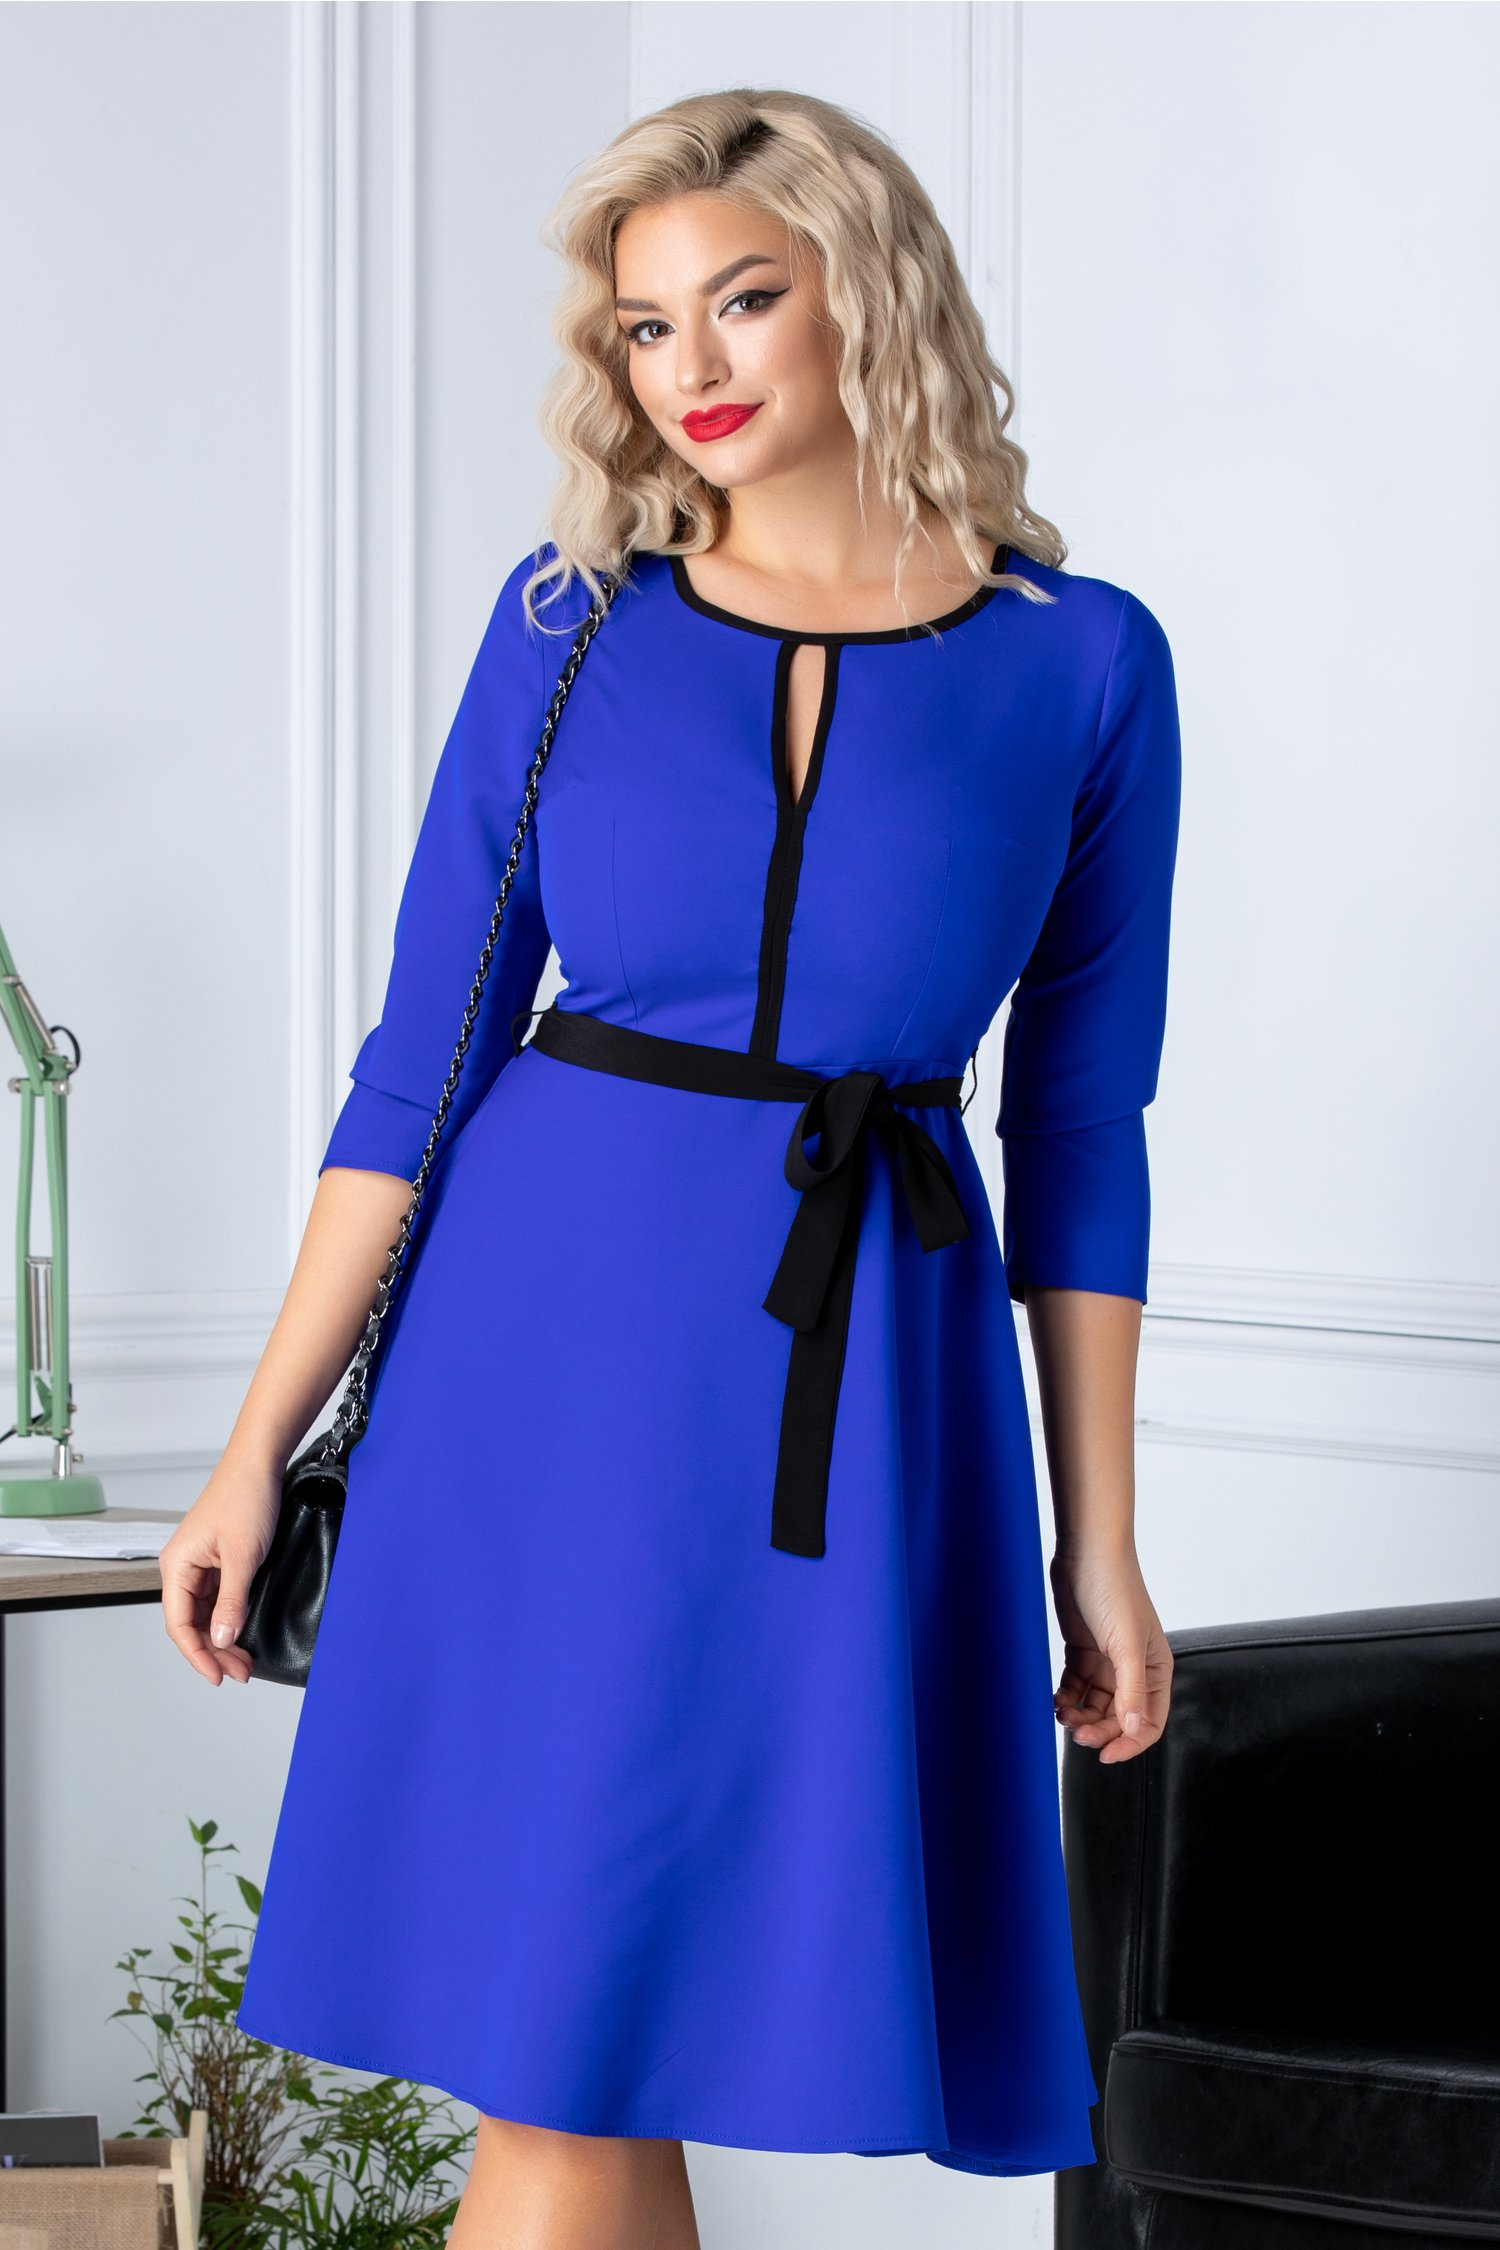 Rochie Ade clos albastra cu cordon in talie